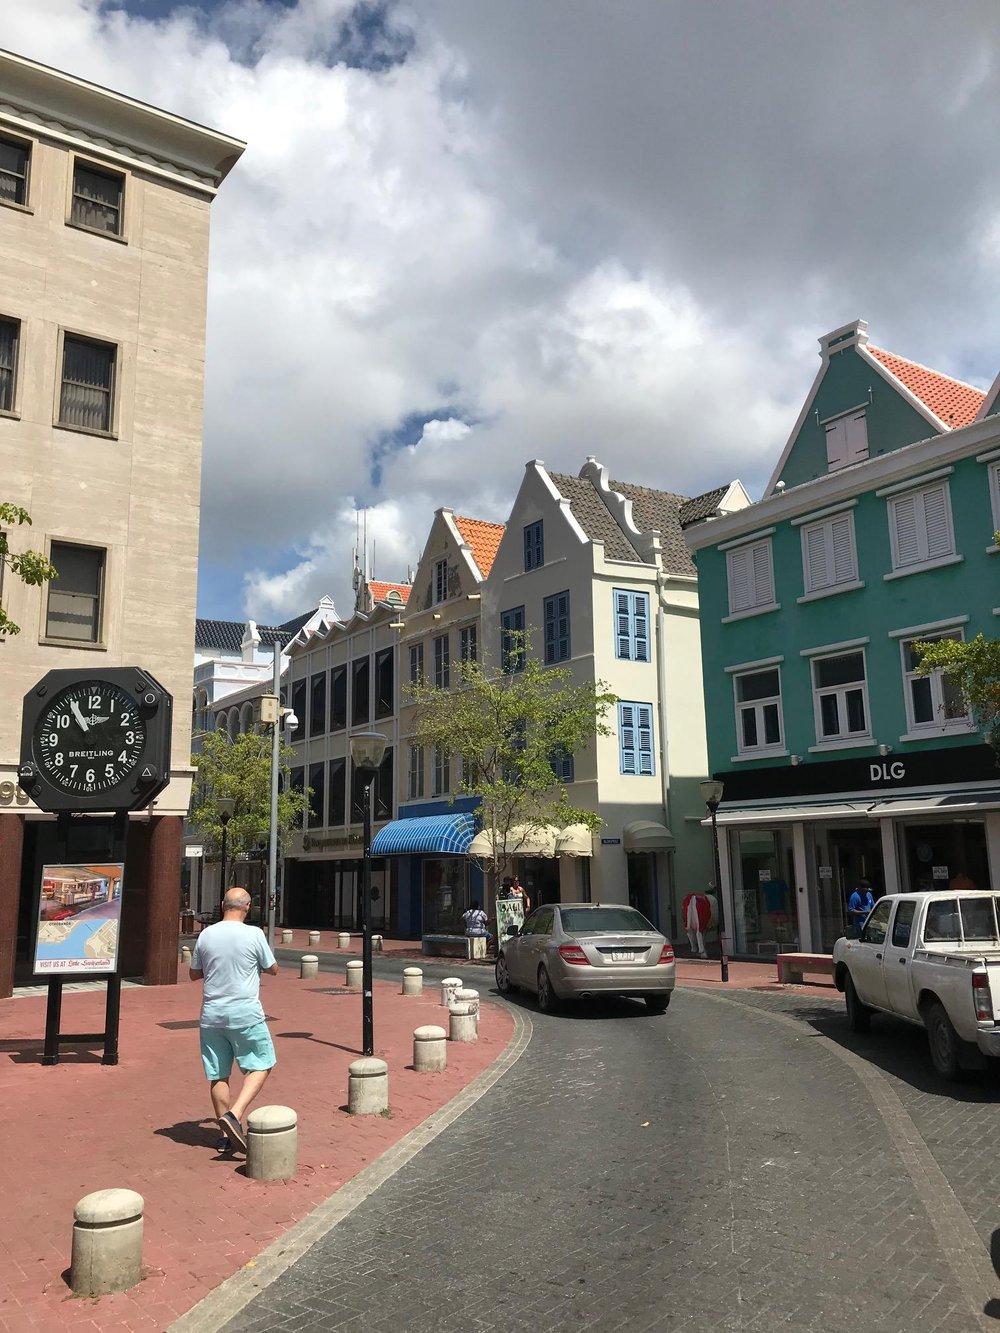 Calles del centro de Willemstad, capital de Curazao